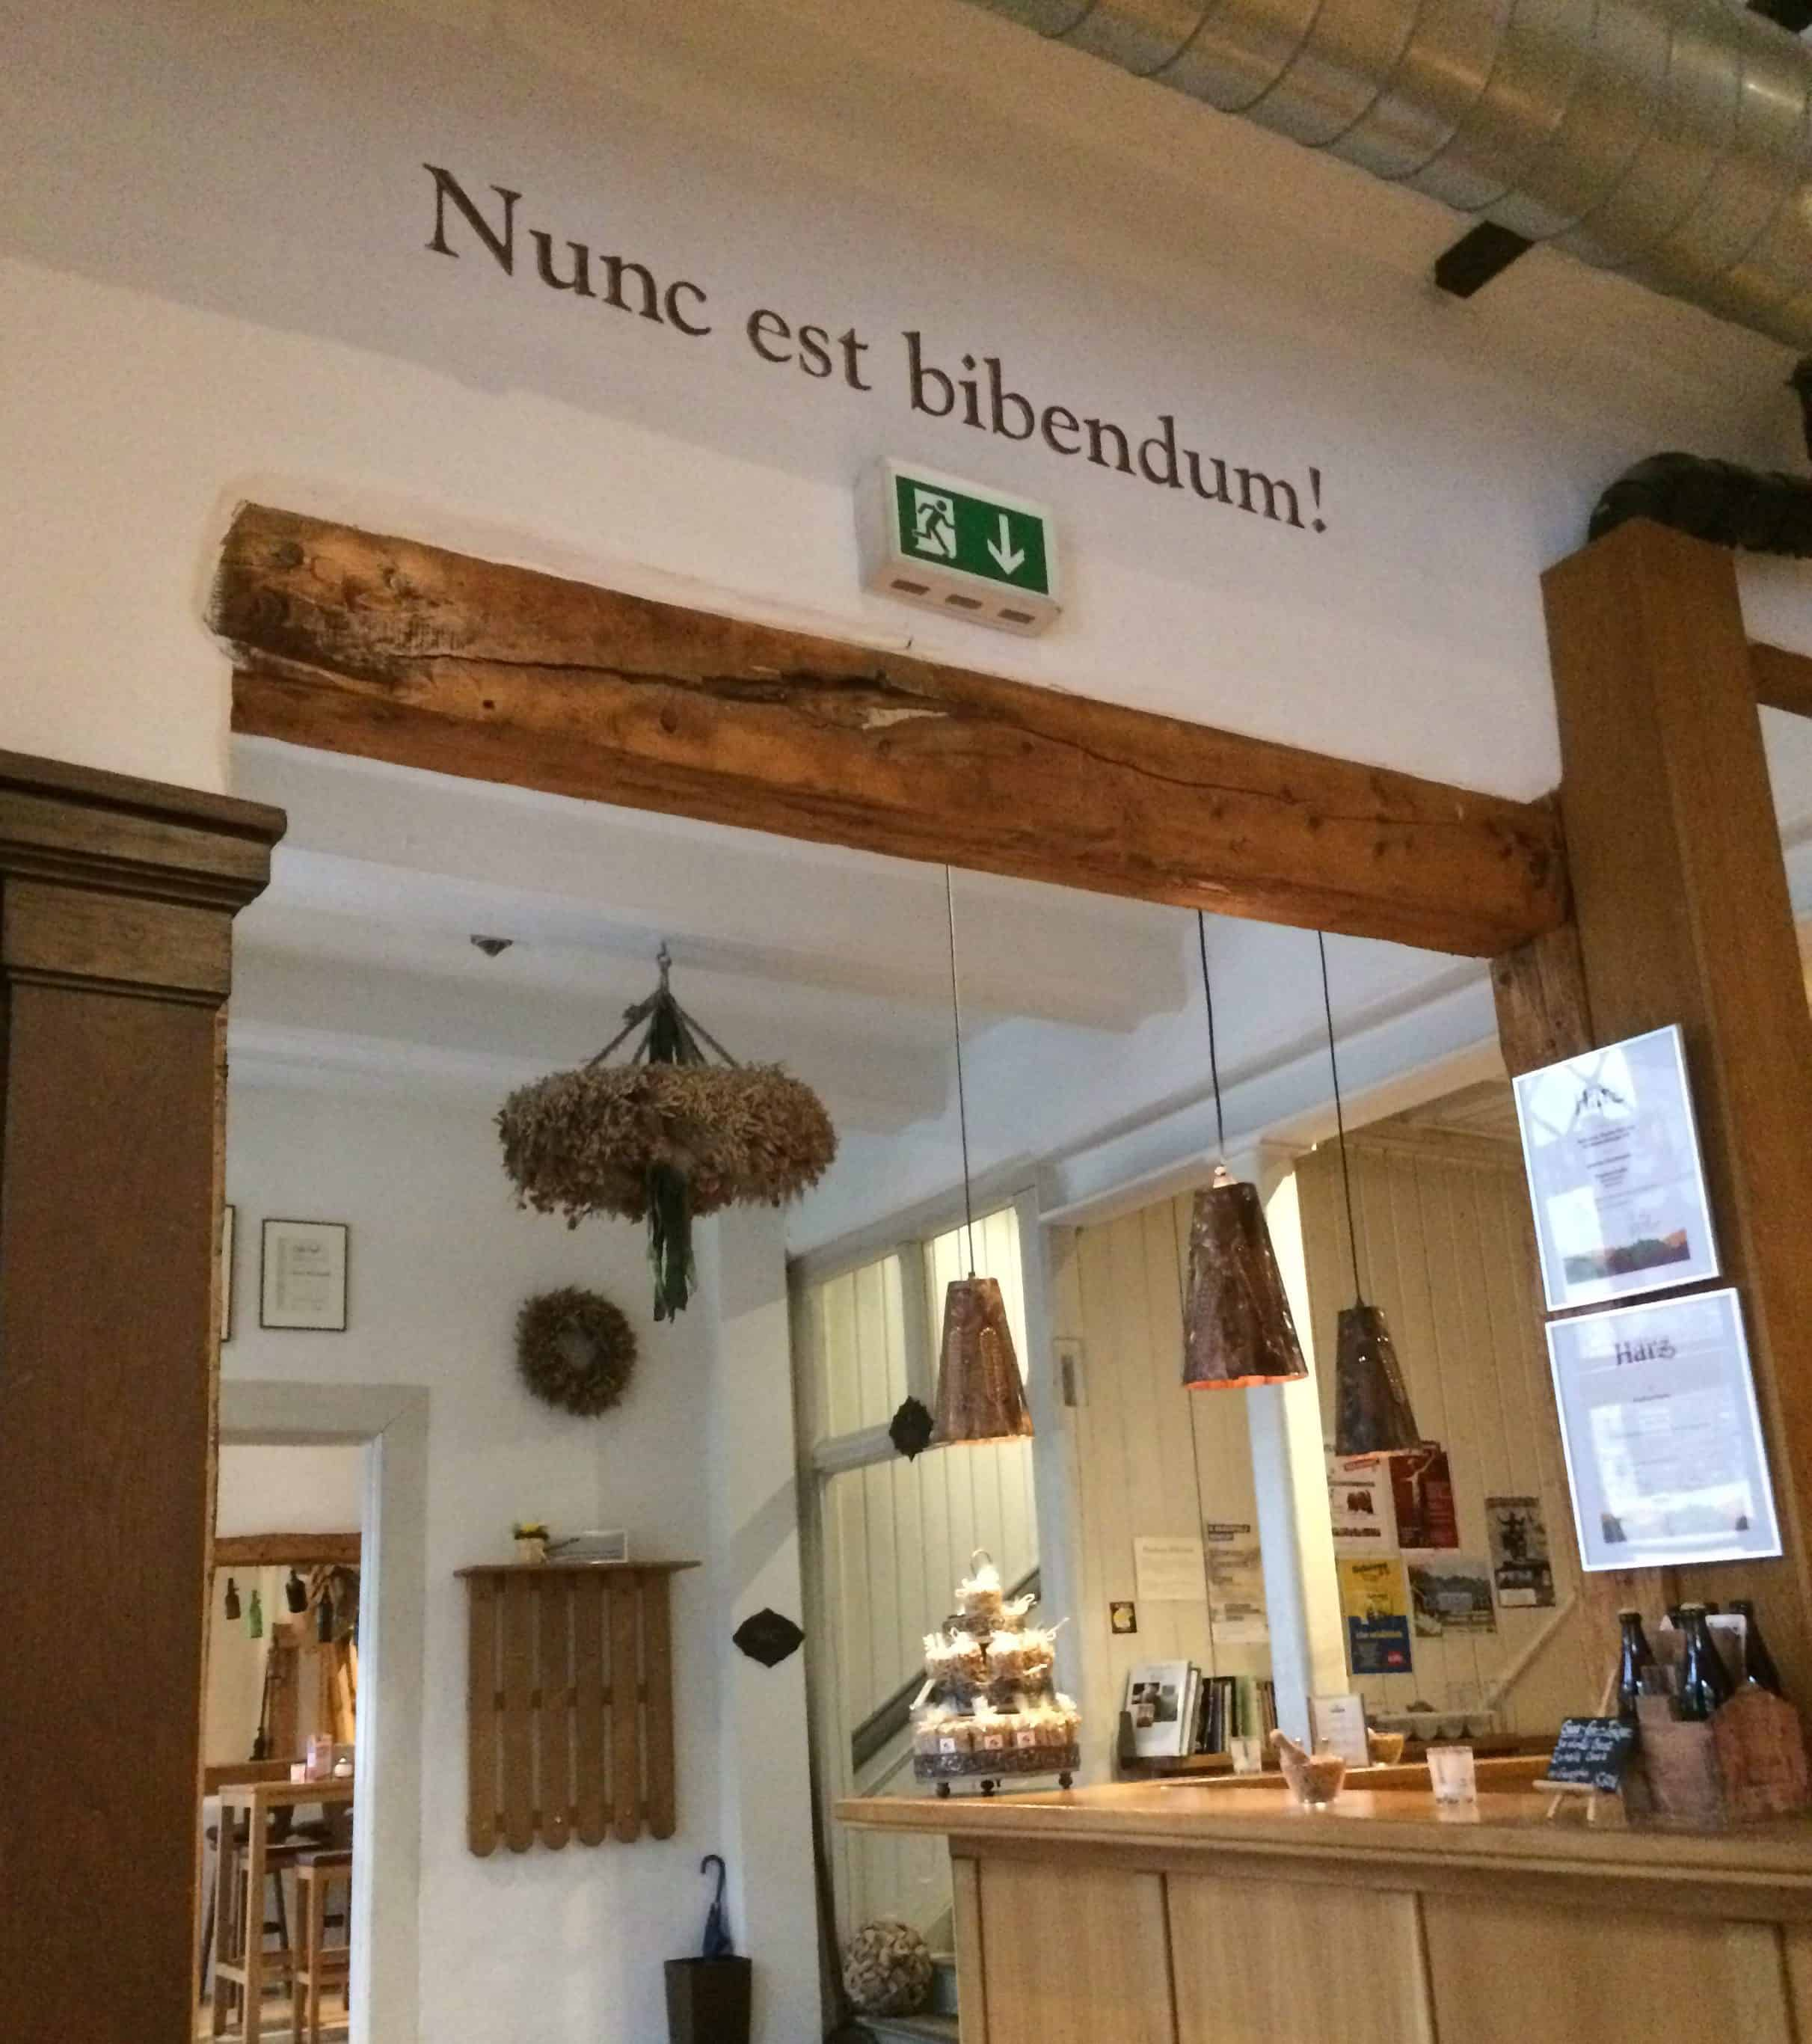 Brauhaus motto: Nunc est bibendum